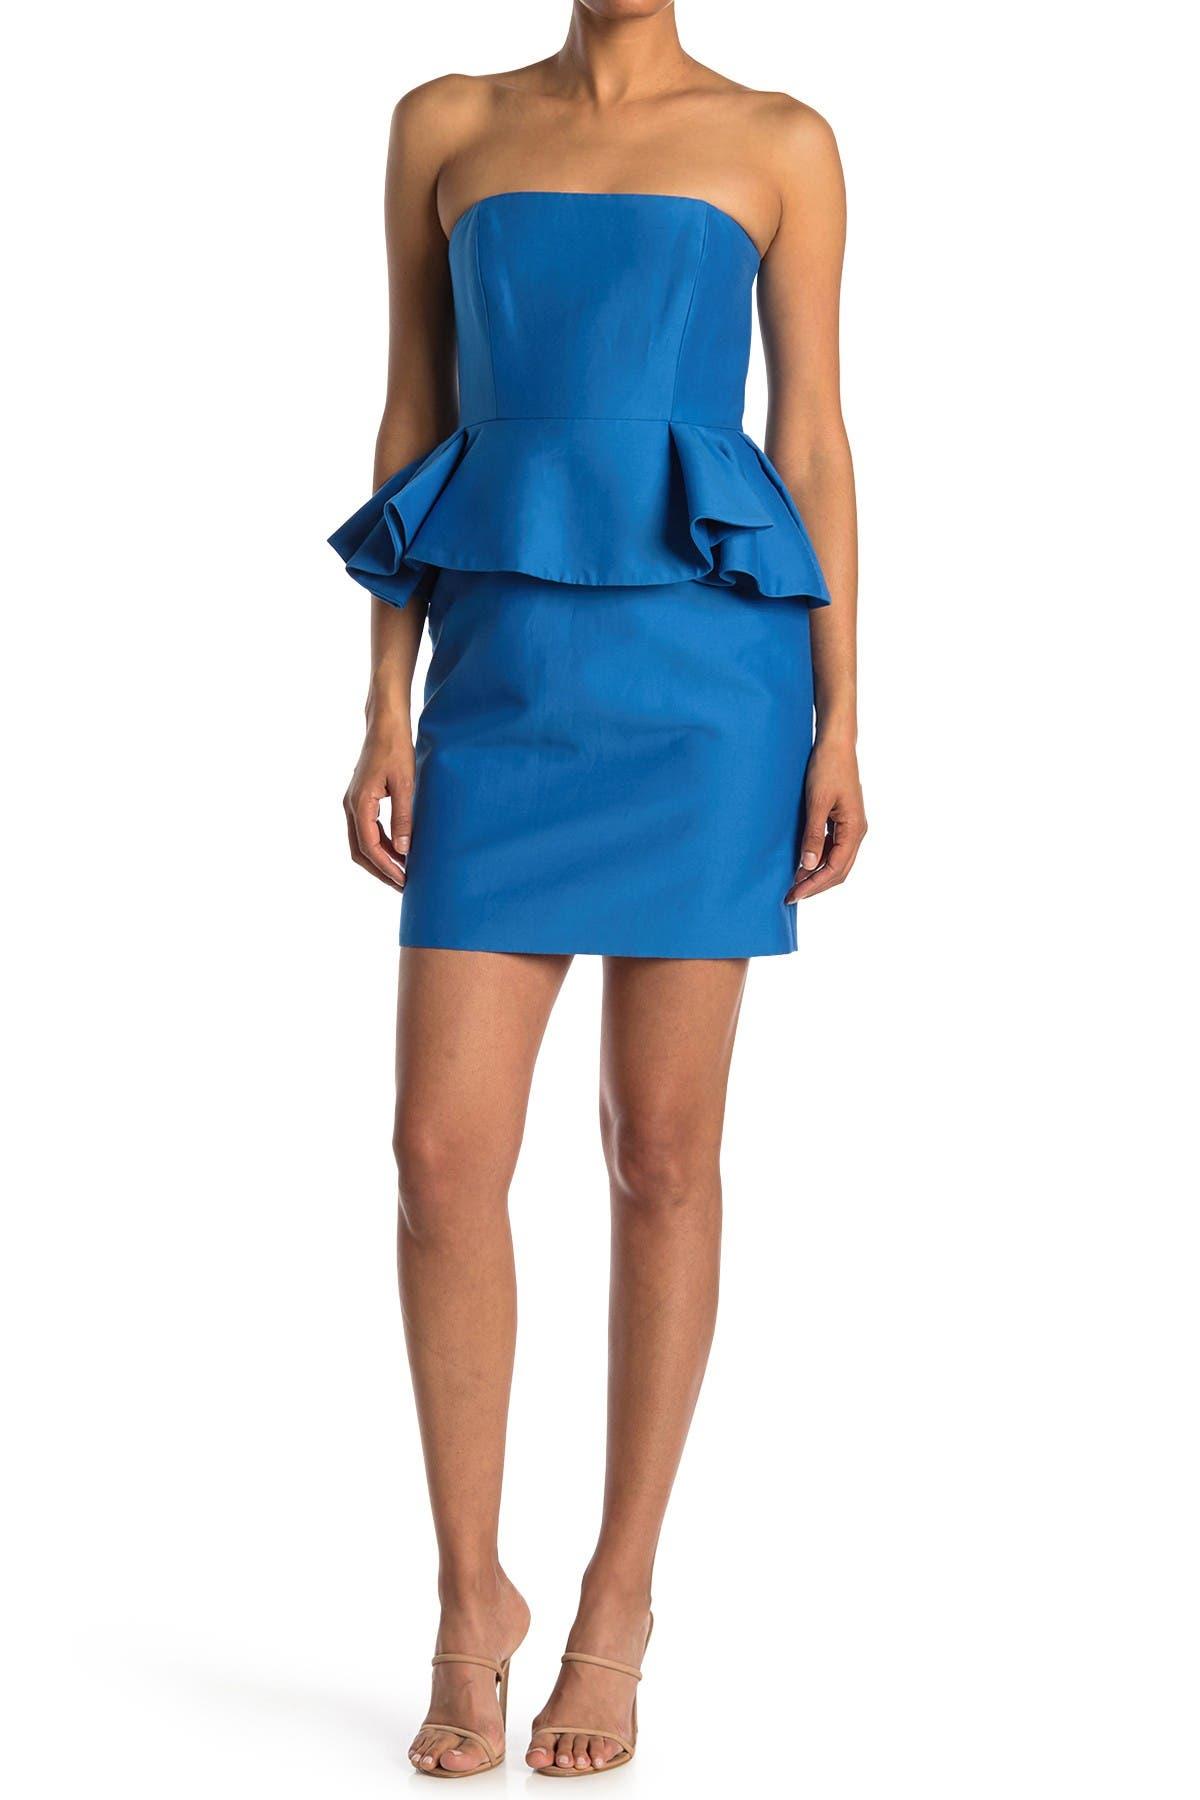 Image of HALSTON Strapless Peplum Dress